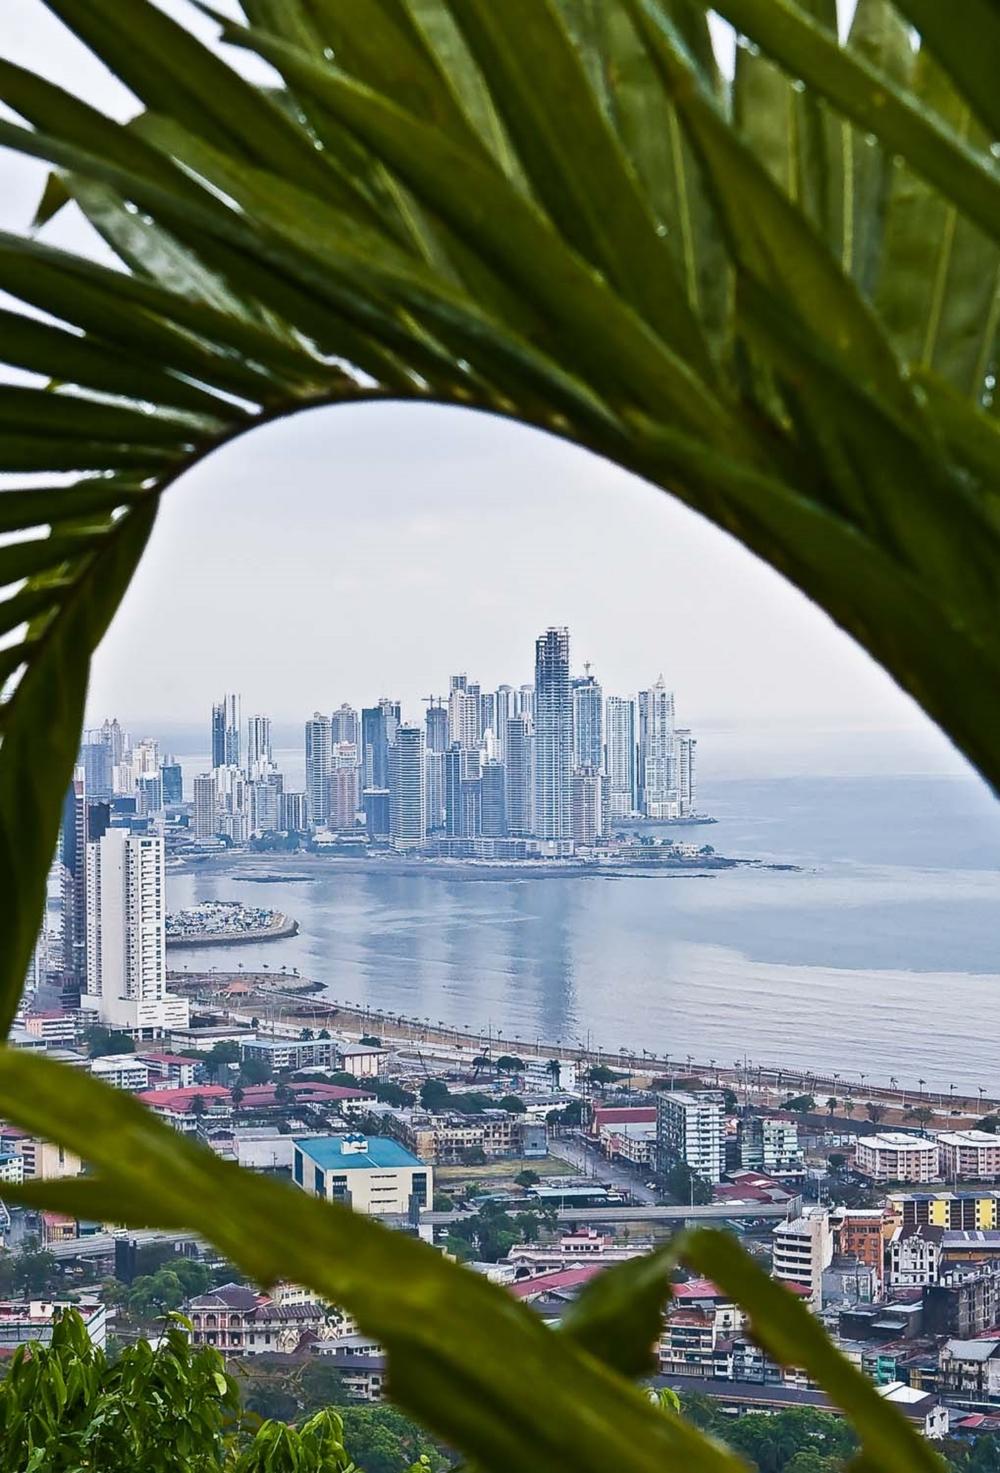 Panama_IMG_2496.JPG